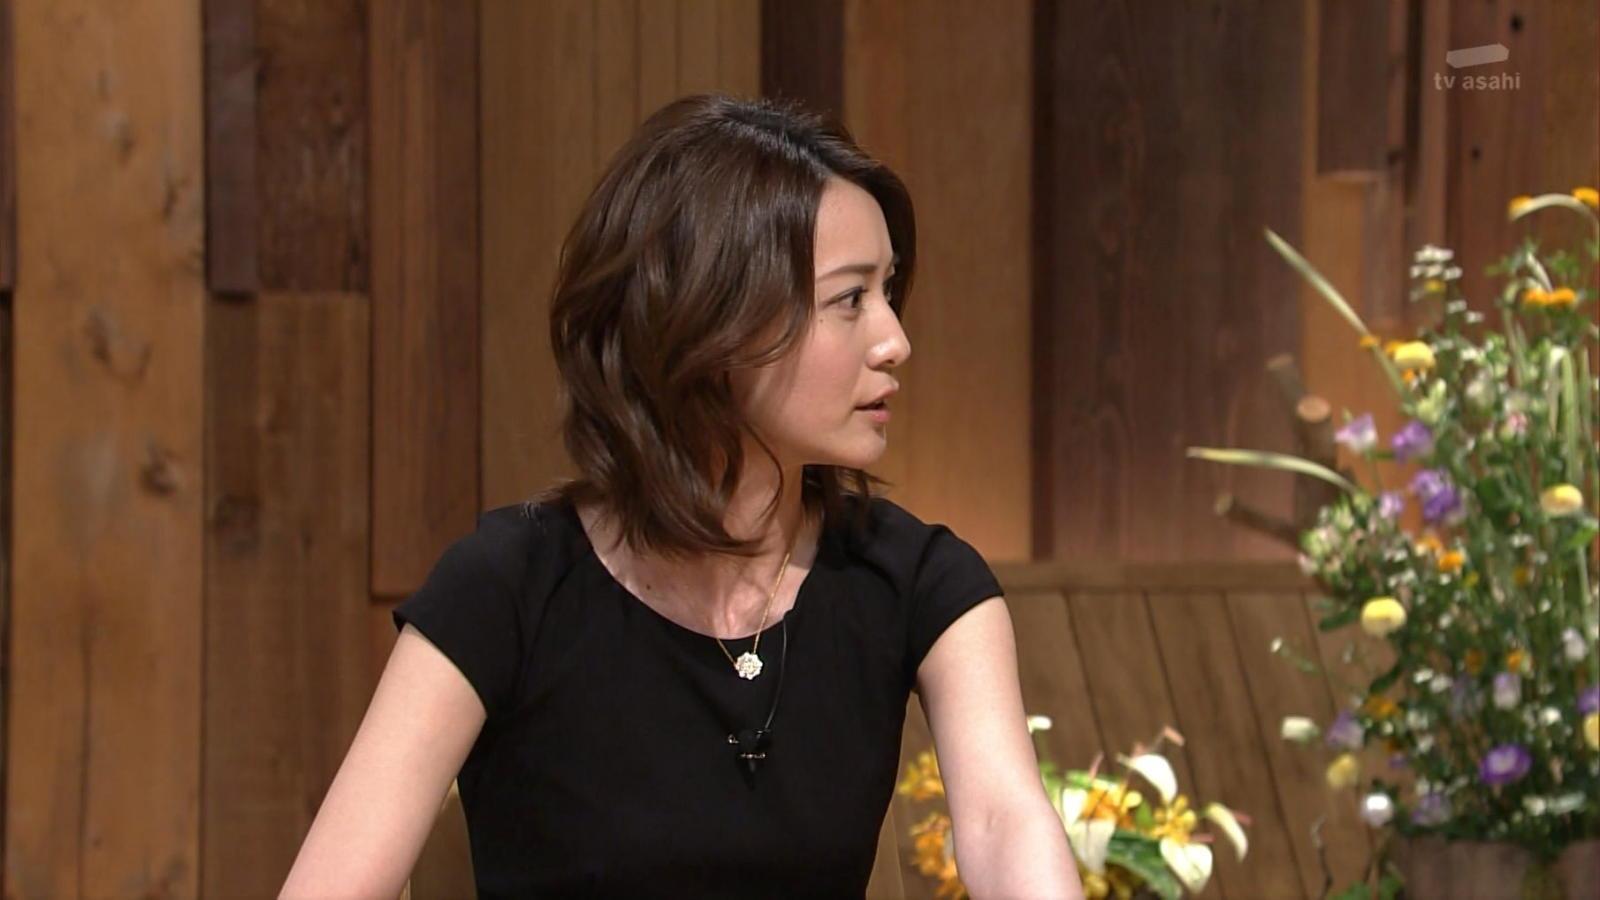 NAVER まとめ結婚してほしくない小川彩佳アナのキャプチャー画像集